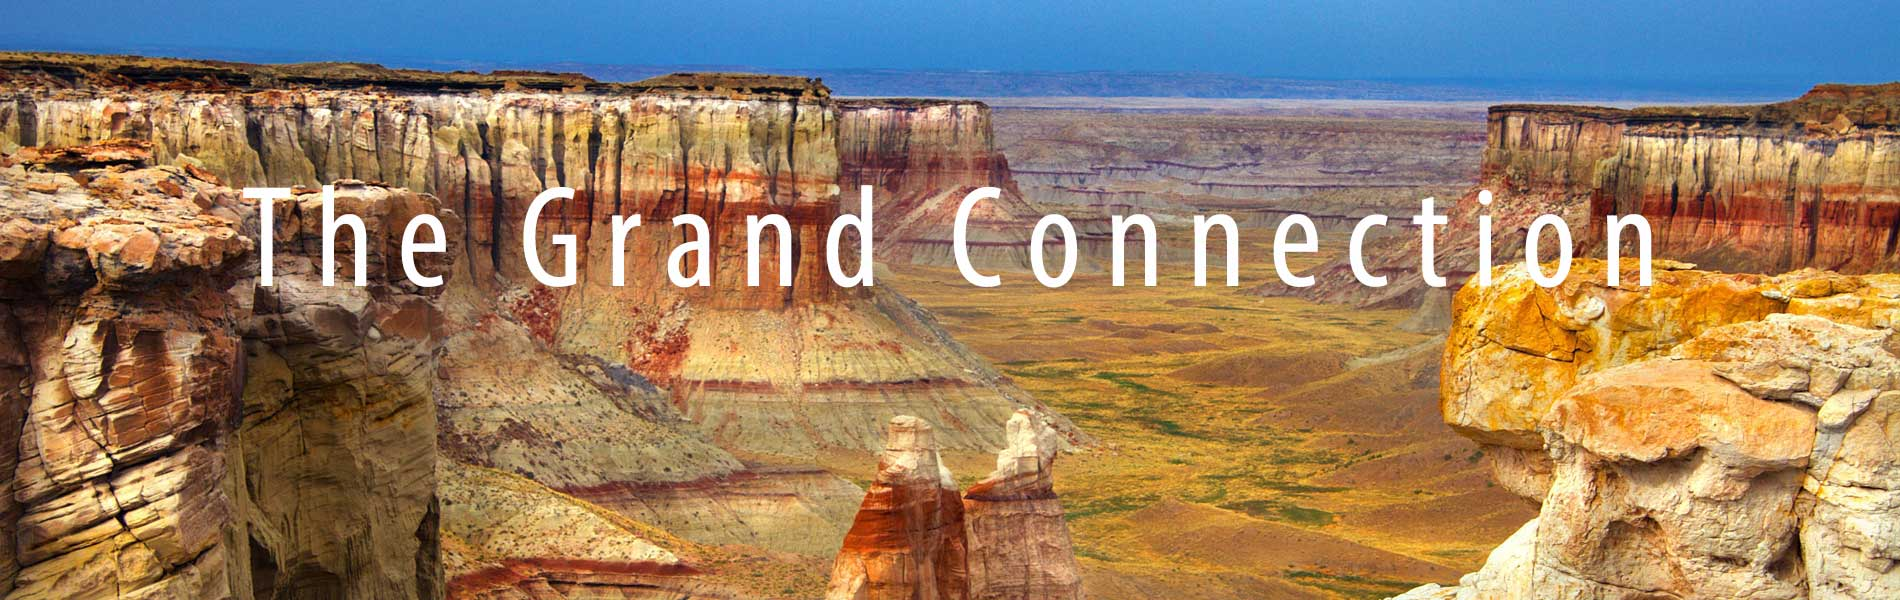 Coal-Mine-Canyon_grandconnection_1